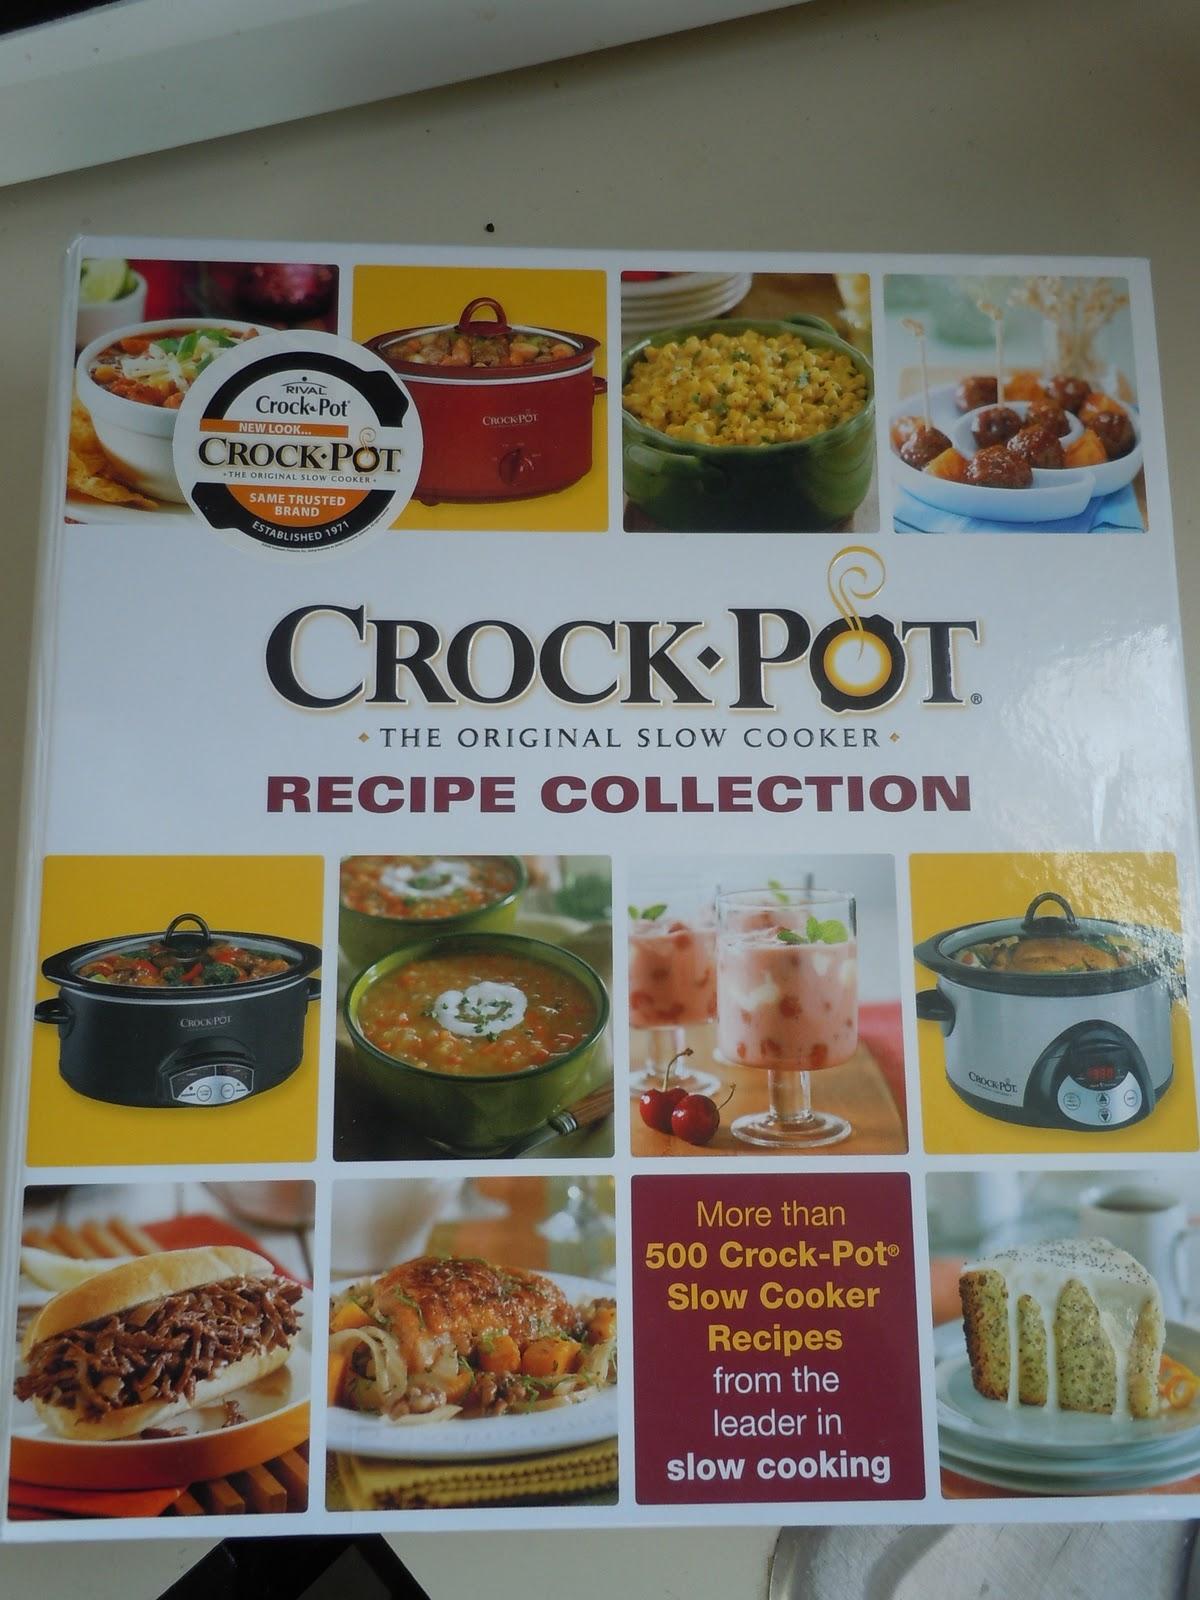 http://4.bp.blogspot.com/_5ACY1sUhuoA/TUtRHKC6YPI/AAAAAAAAARU/LlQ3EyREZek/s1600/DSCN0806.JPG#cooking%20horse